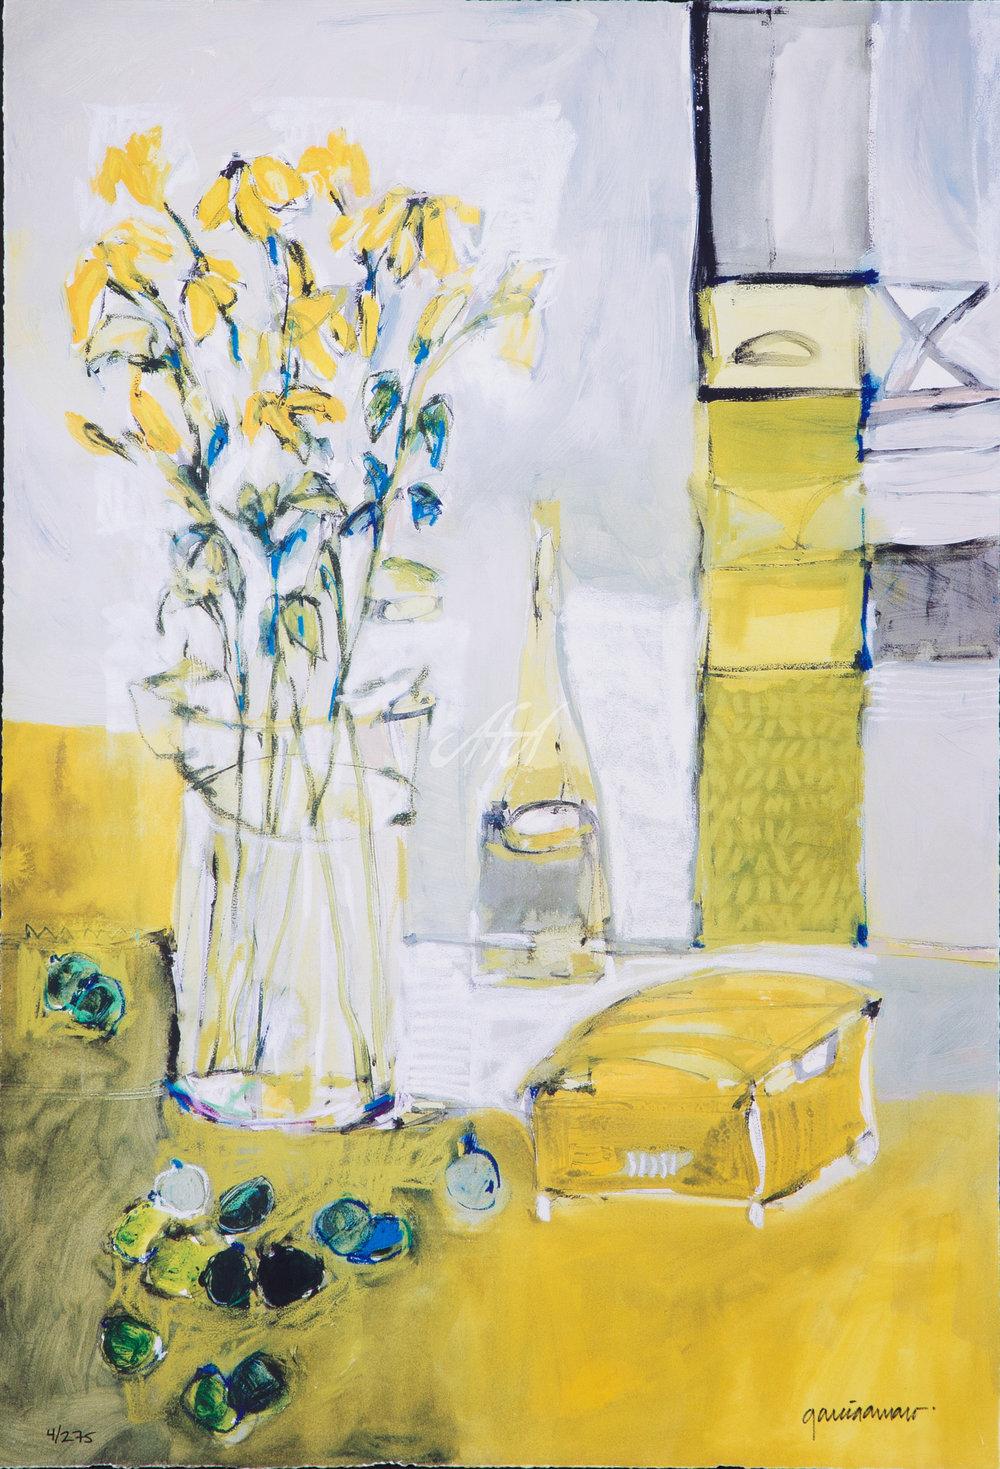 Amaro Gallery — American Fine Art Inc